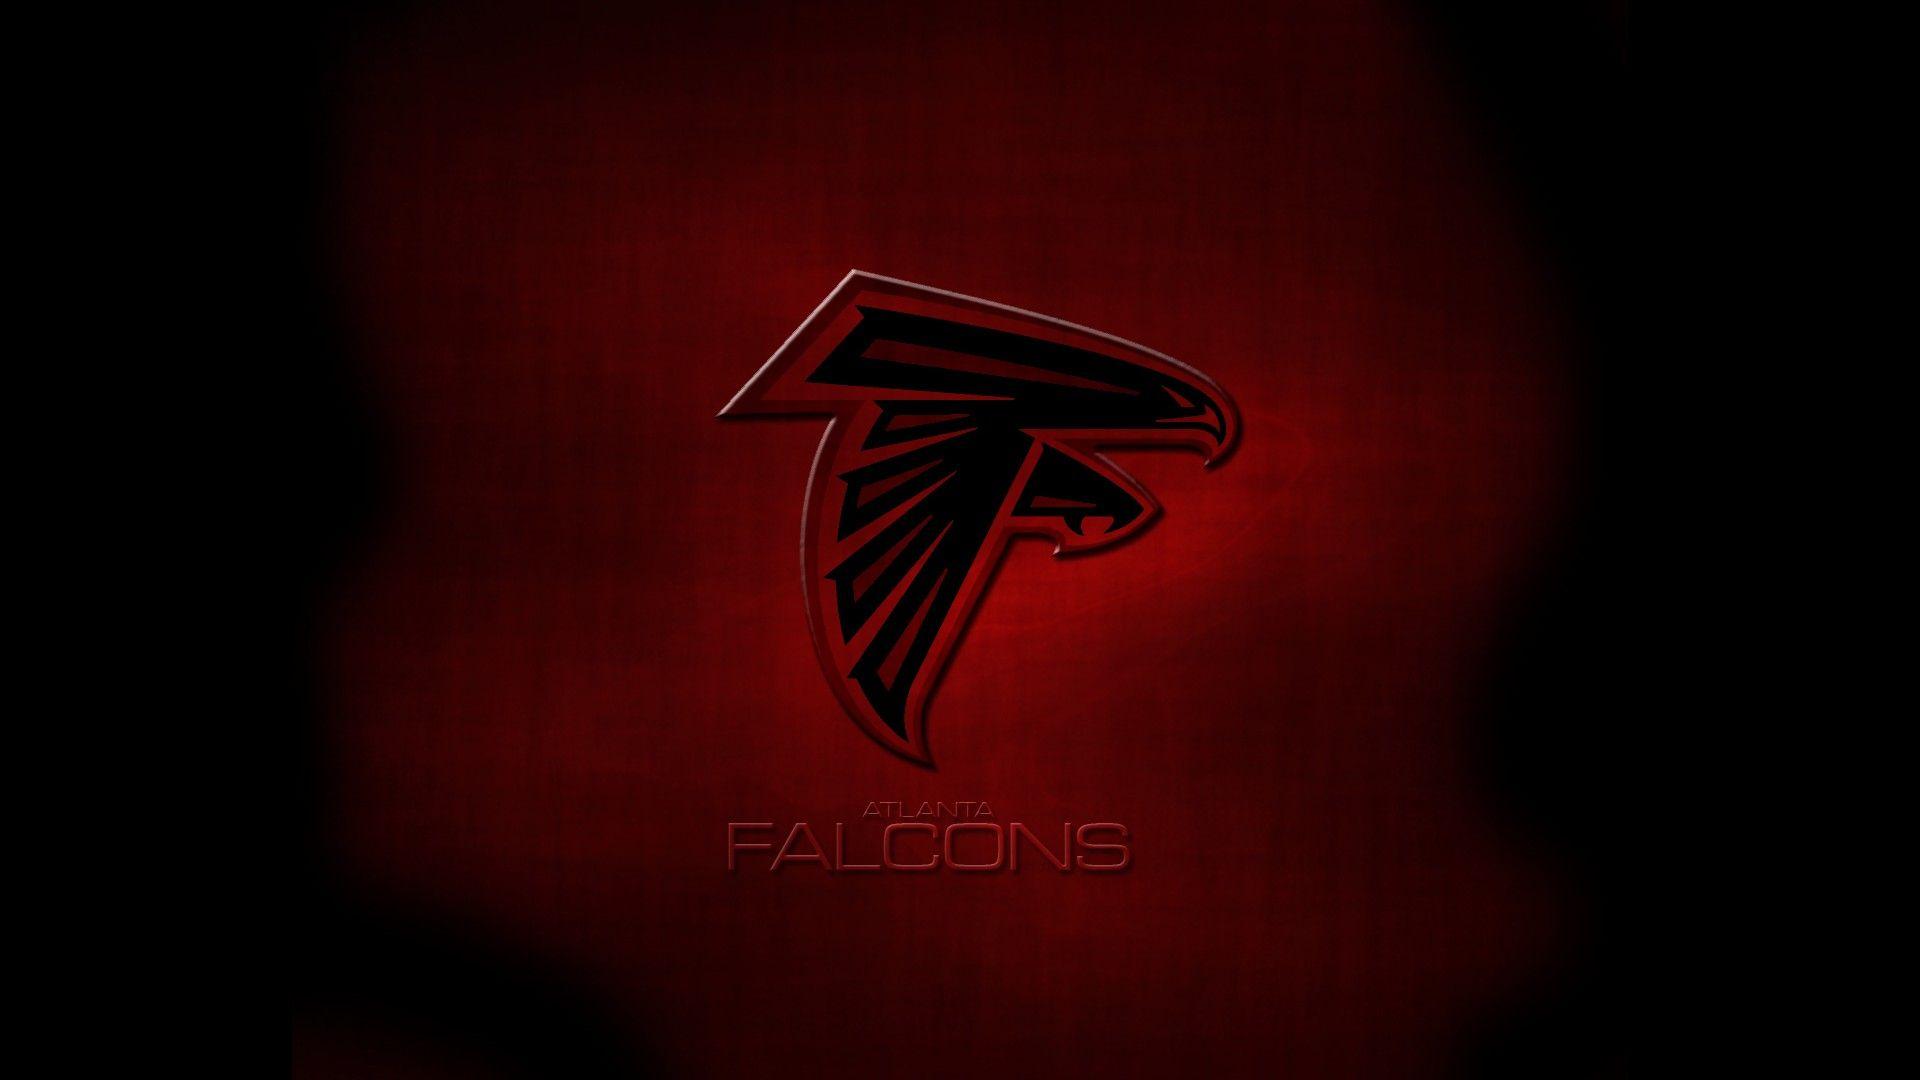 Atlanta Falcons wallpaper image